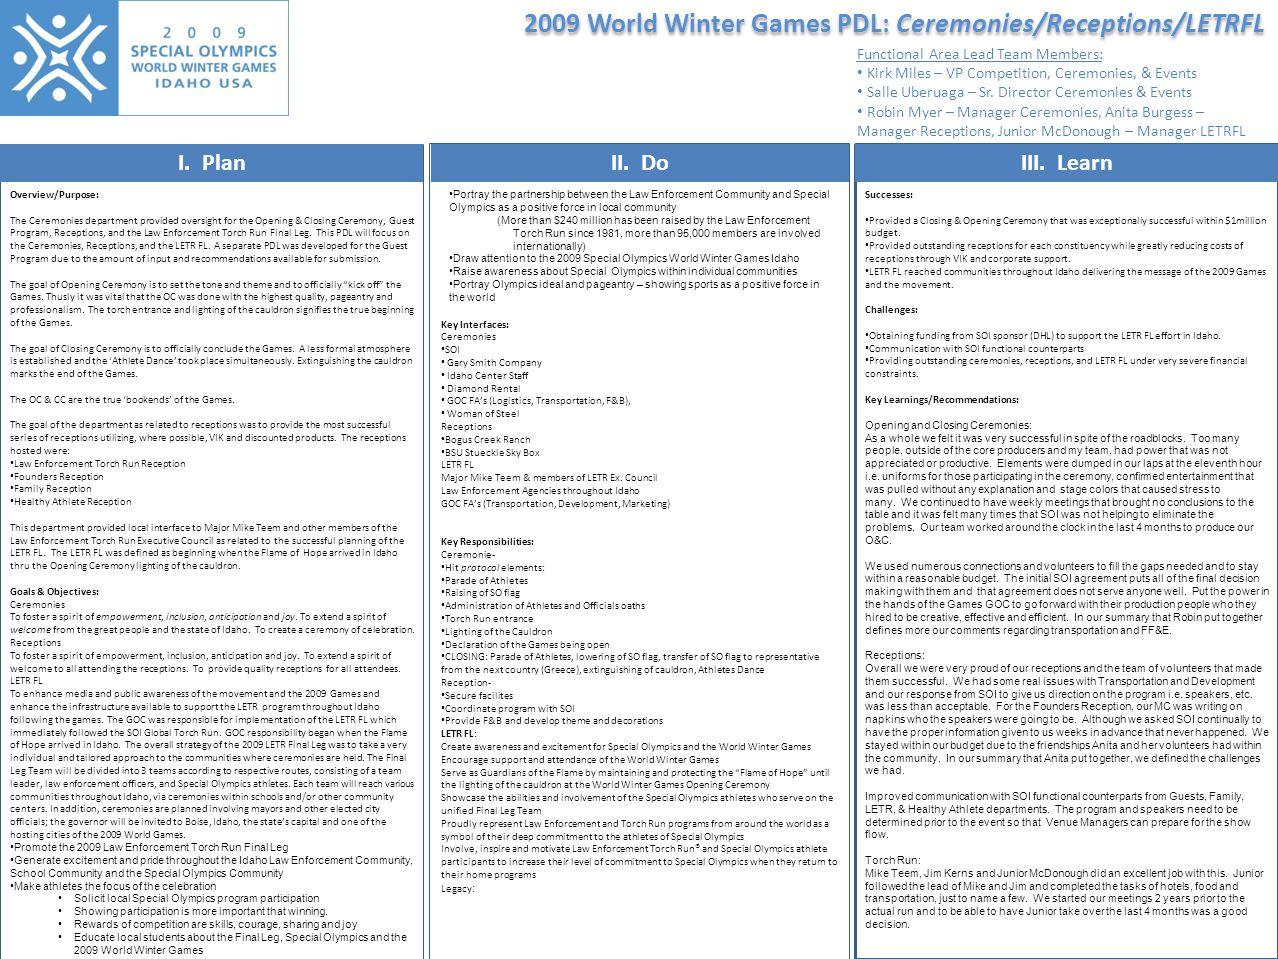 2009 World Winter Games PDL: Ceremonies/Receptions/LETRFL I.